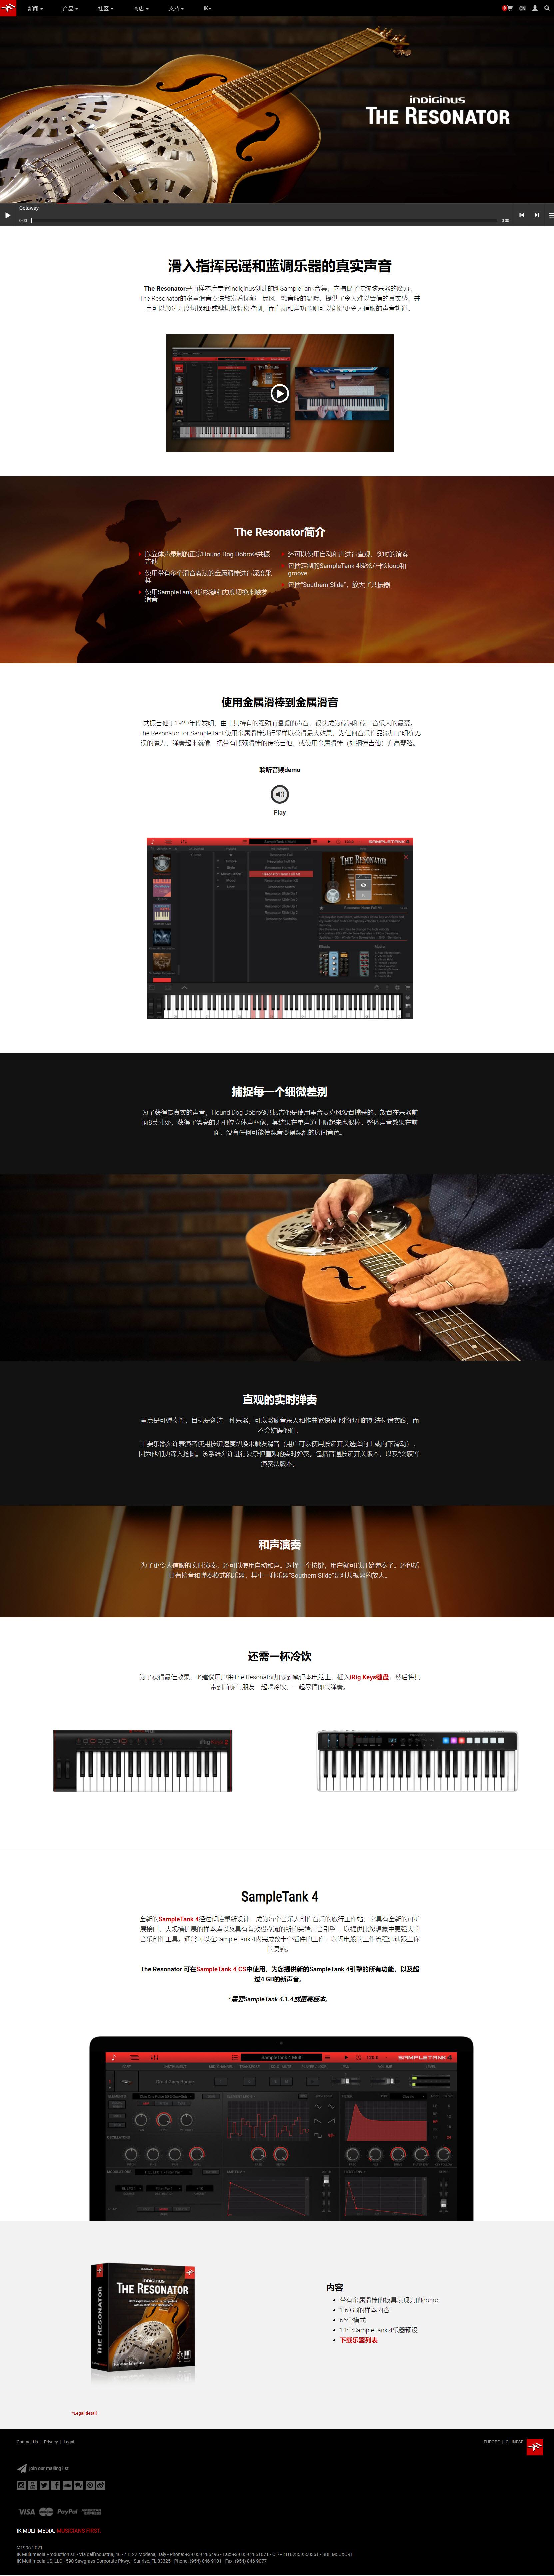 IK Multimedia 发布可用于 SampleTank 的 Resonator 滑音吉他